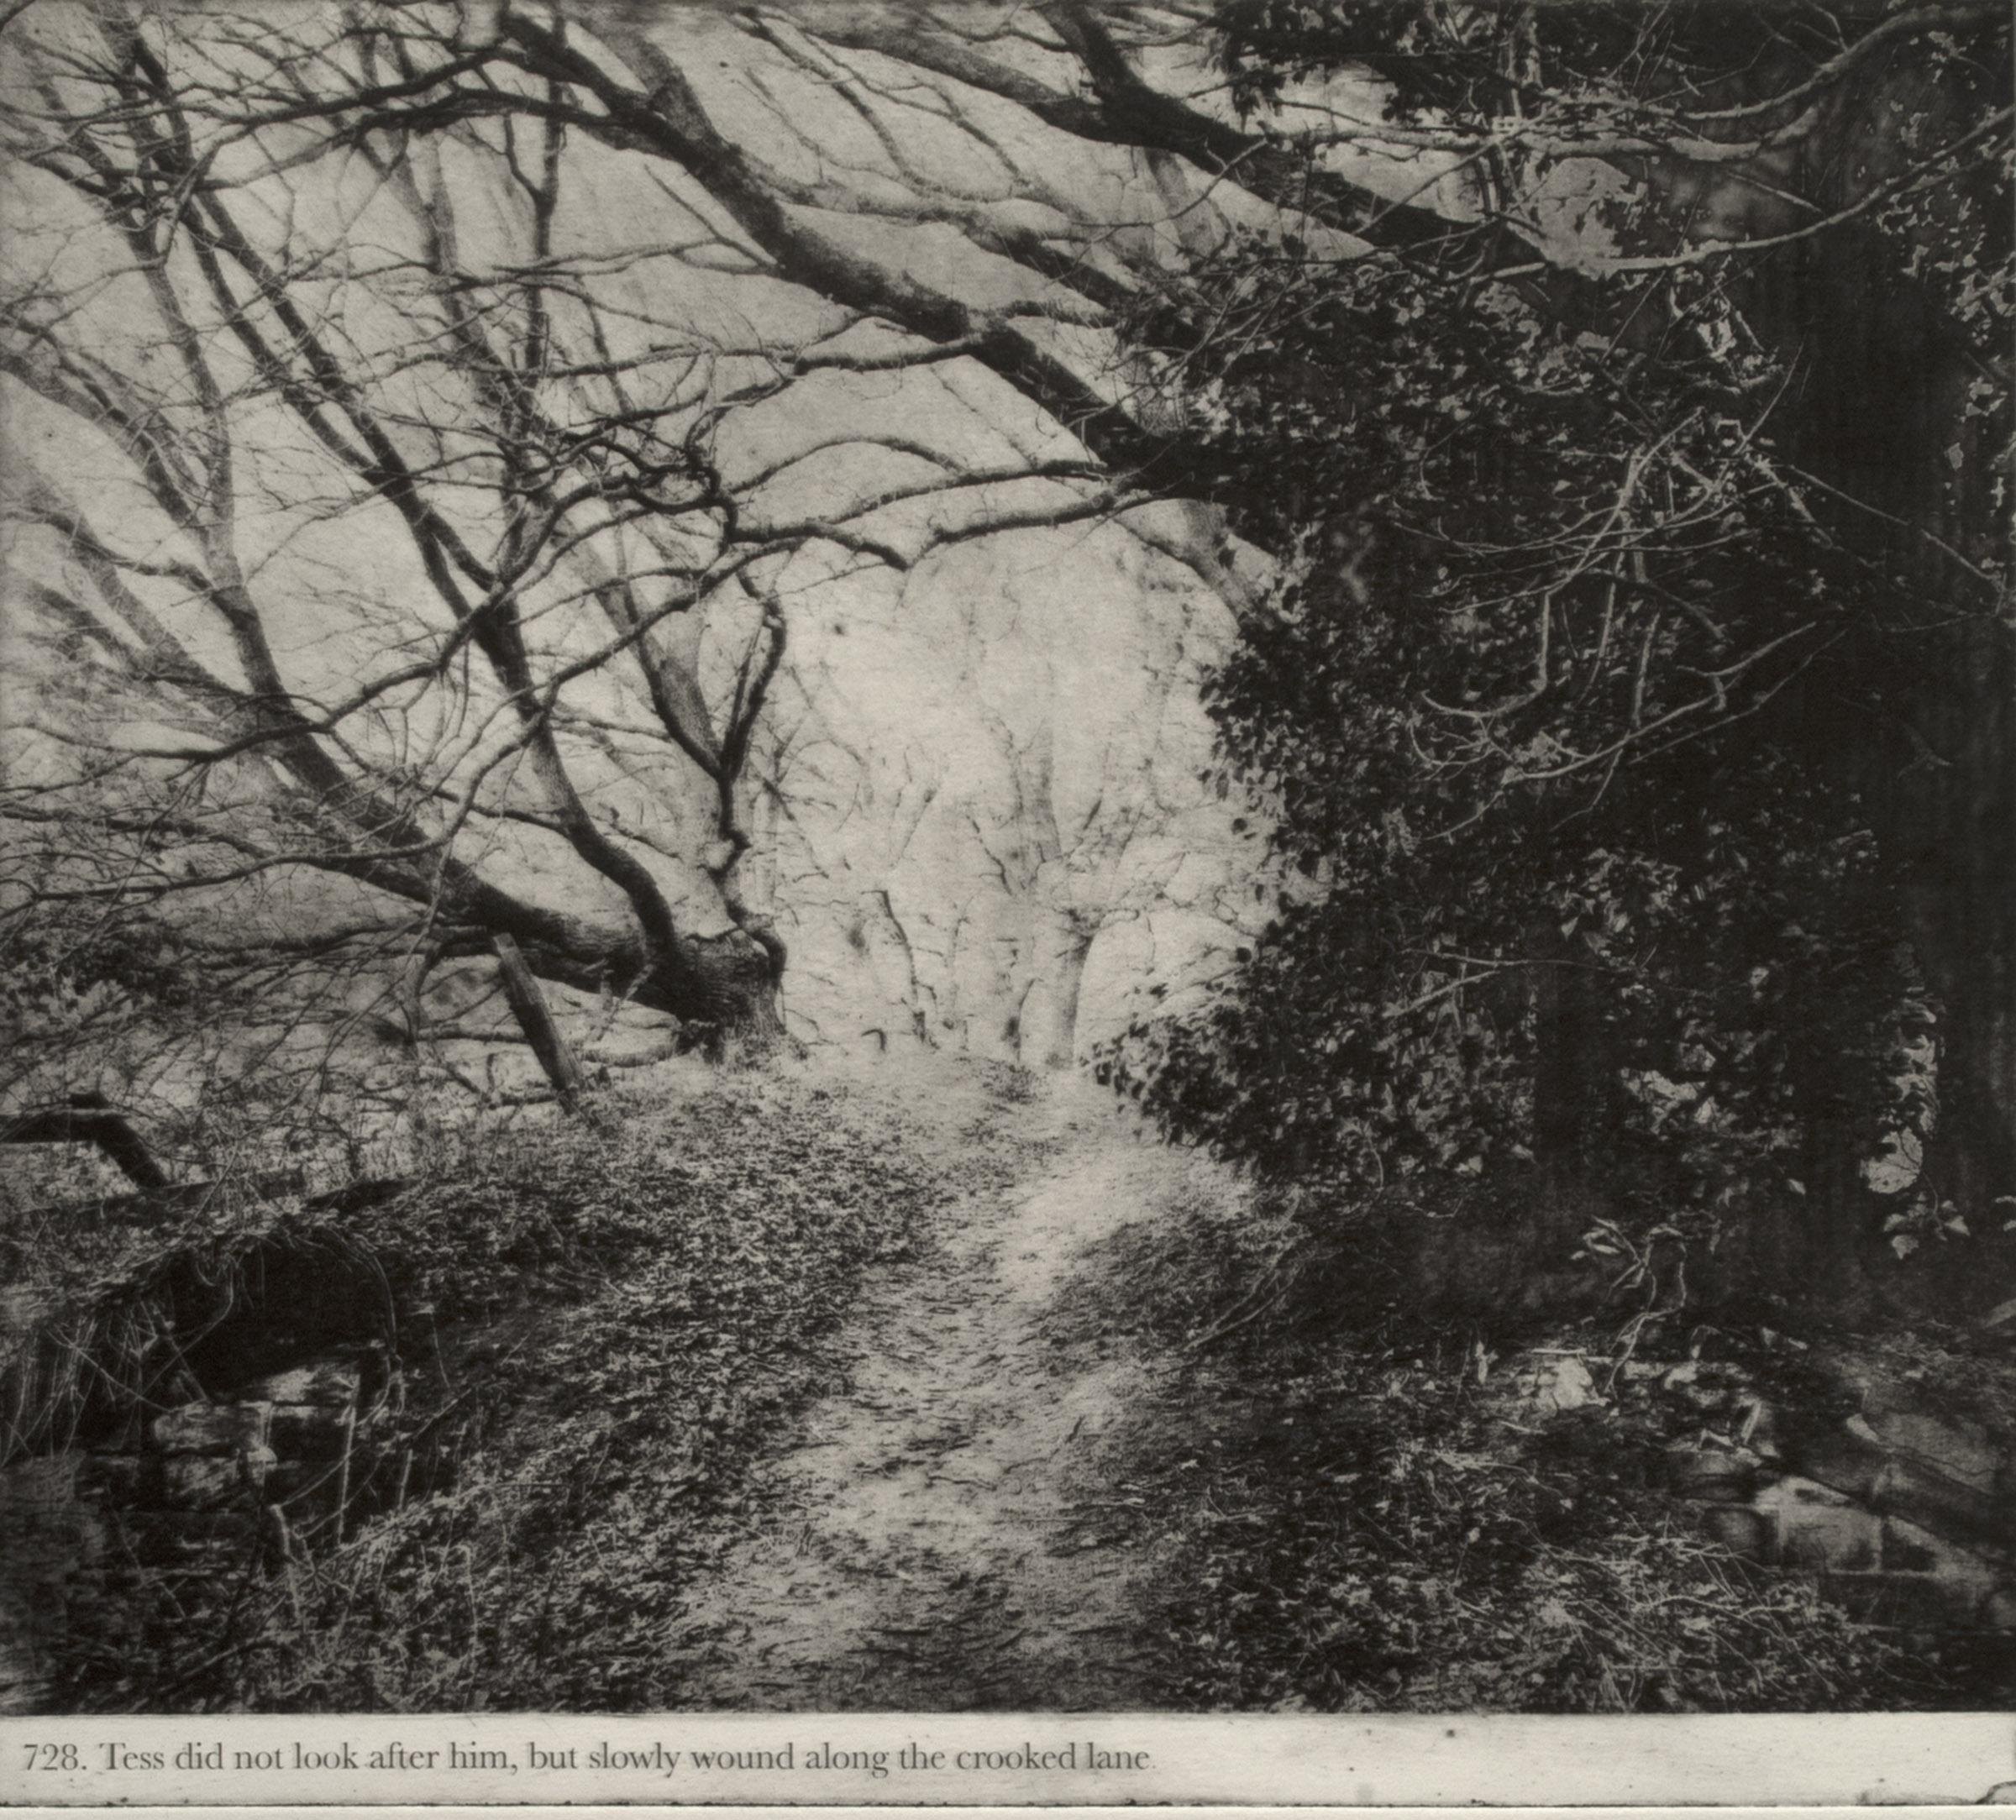 'Thus Tess walked on', Jackie Chettur